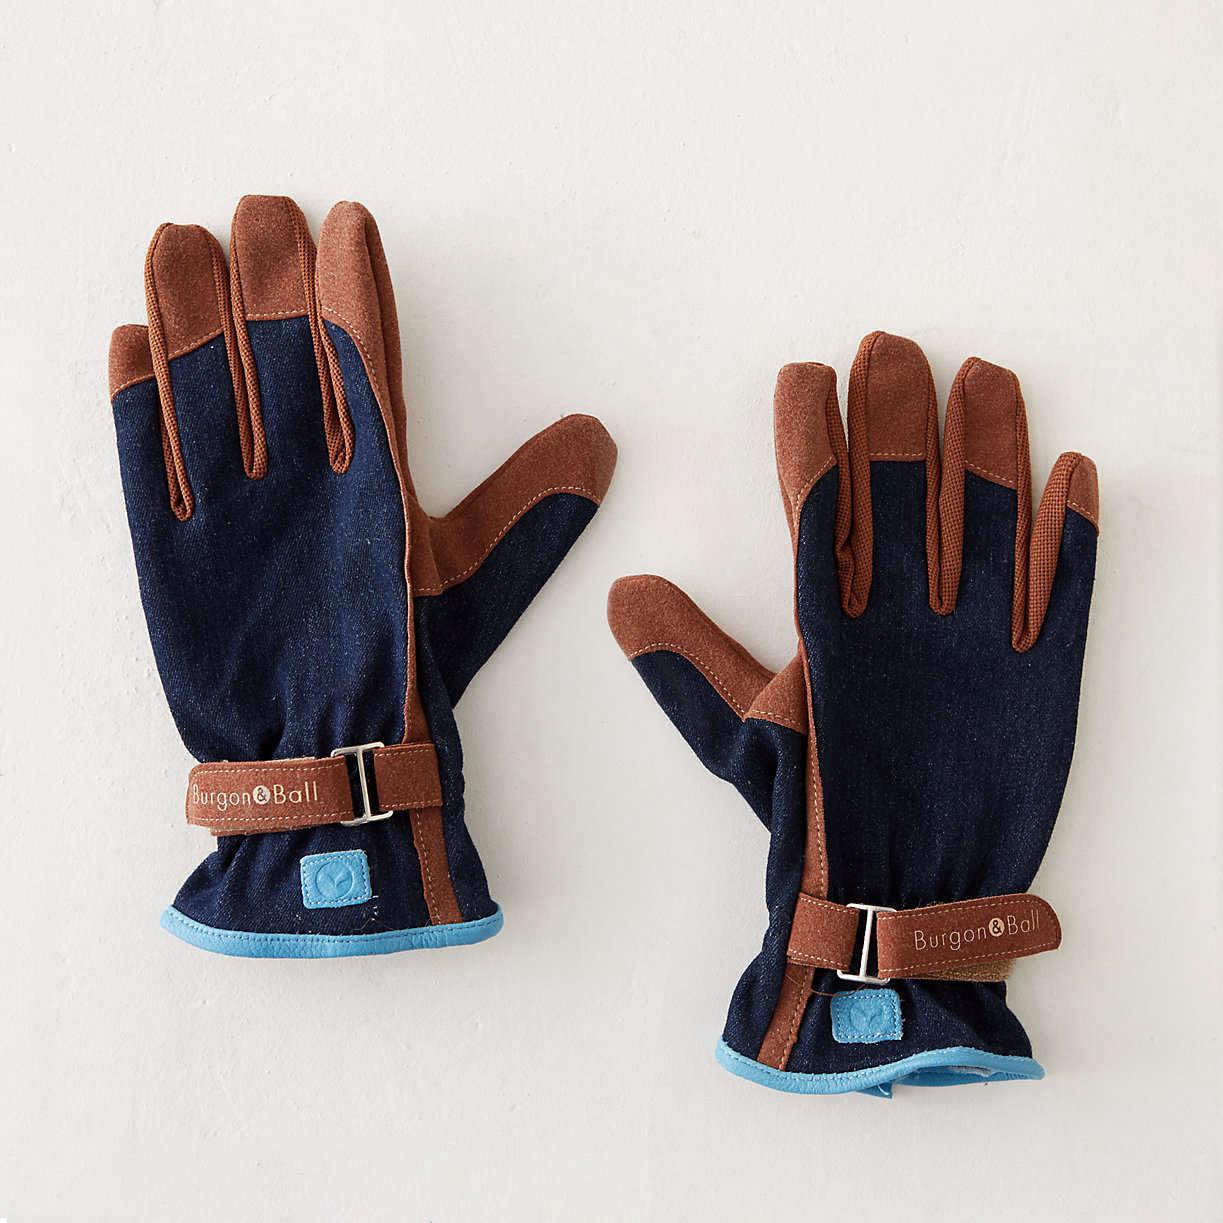 Burgon-ball-garden-gloves-terrain-gardenista